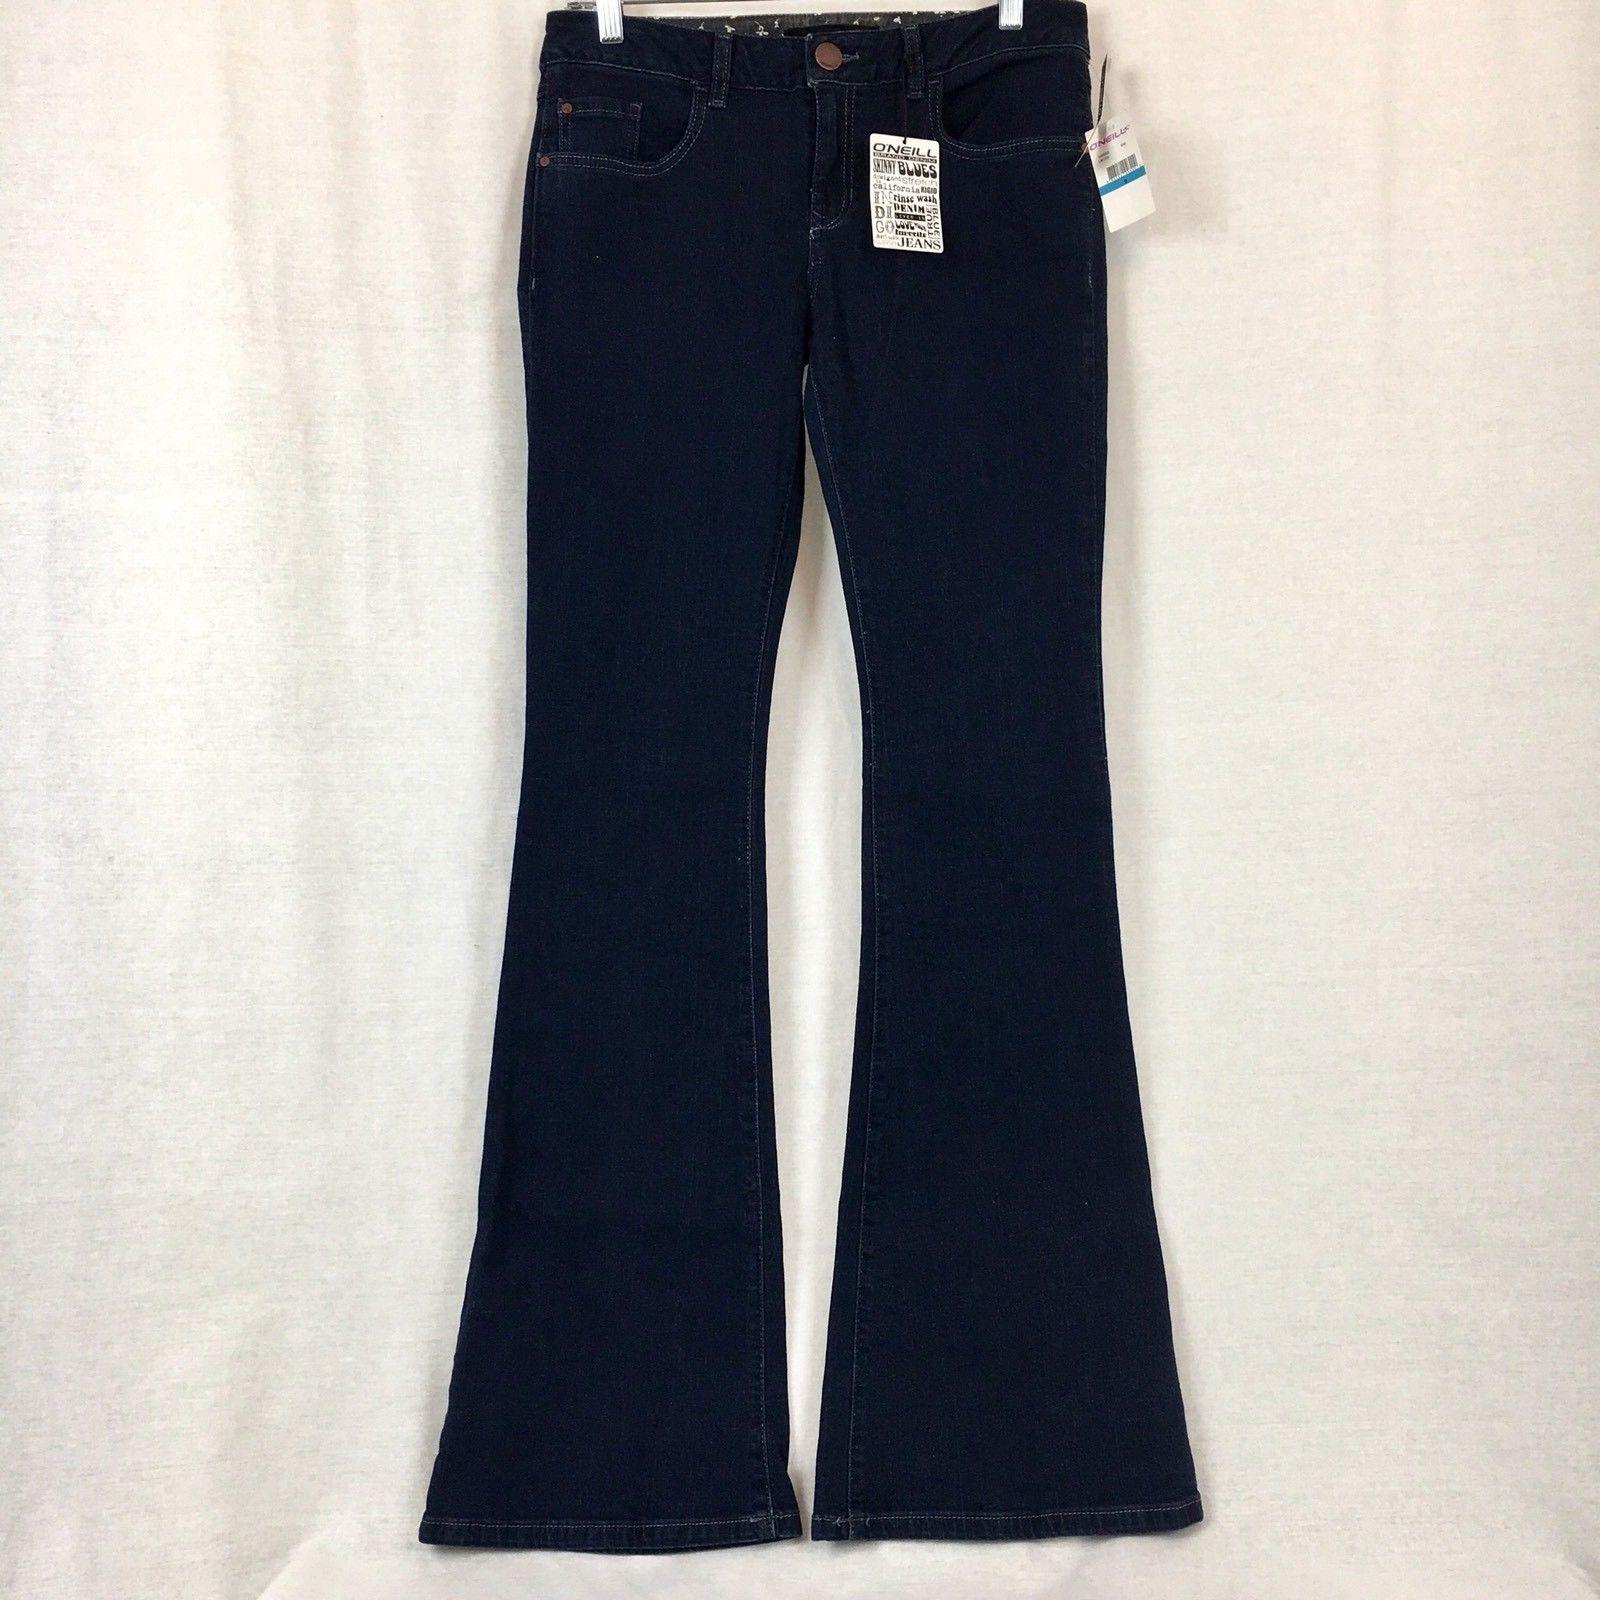 O'Neill Womens Jeans Blue Dark Wash Cotton Stretch Flare Juniors Size 9x34